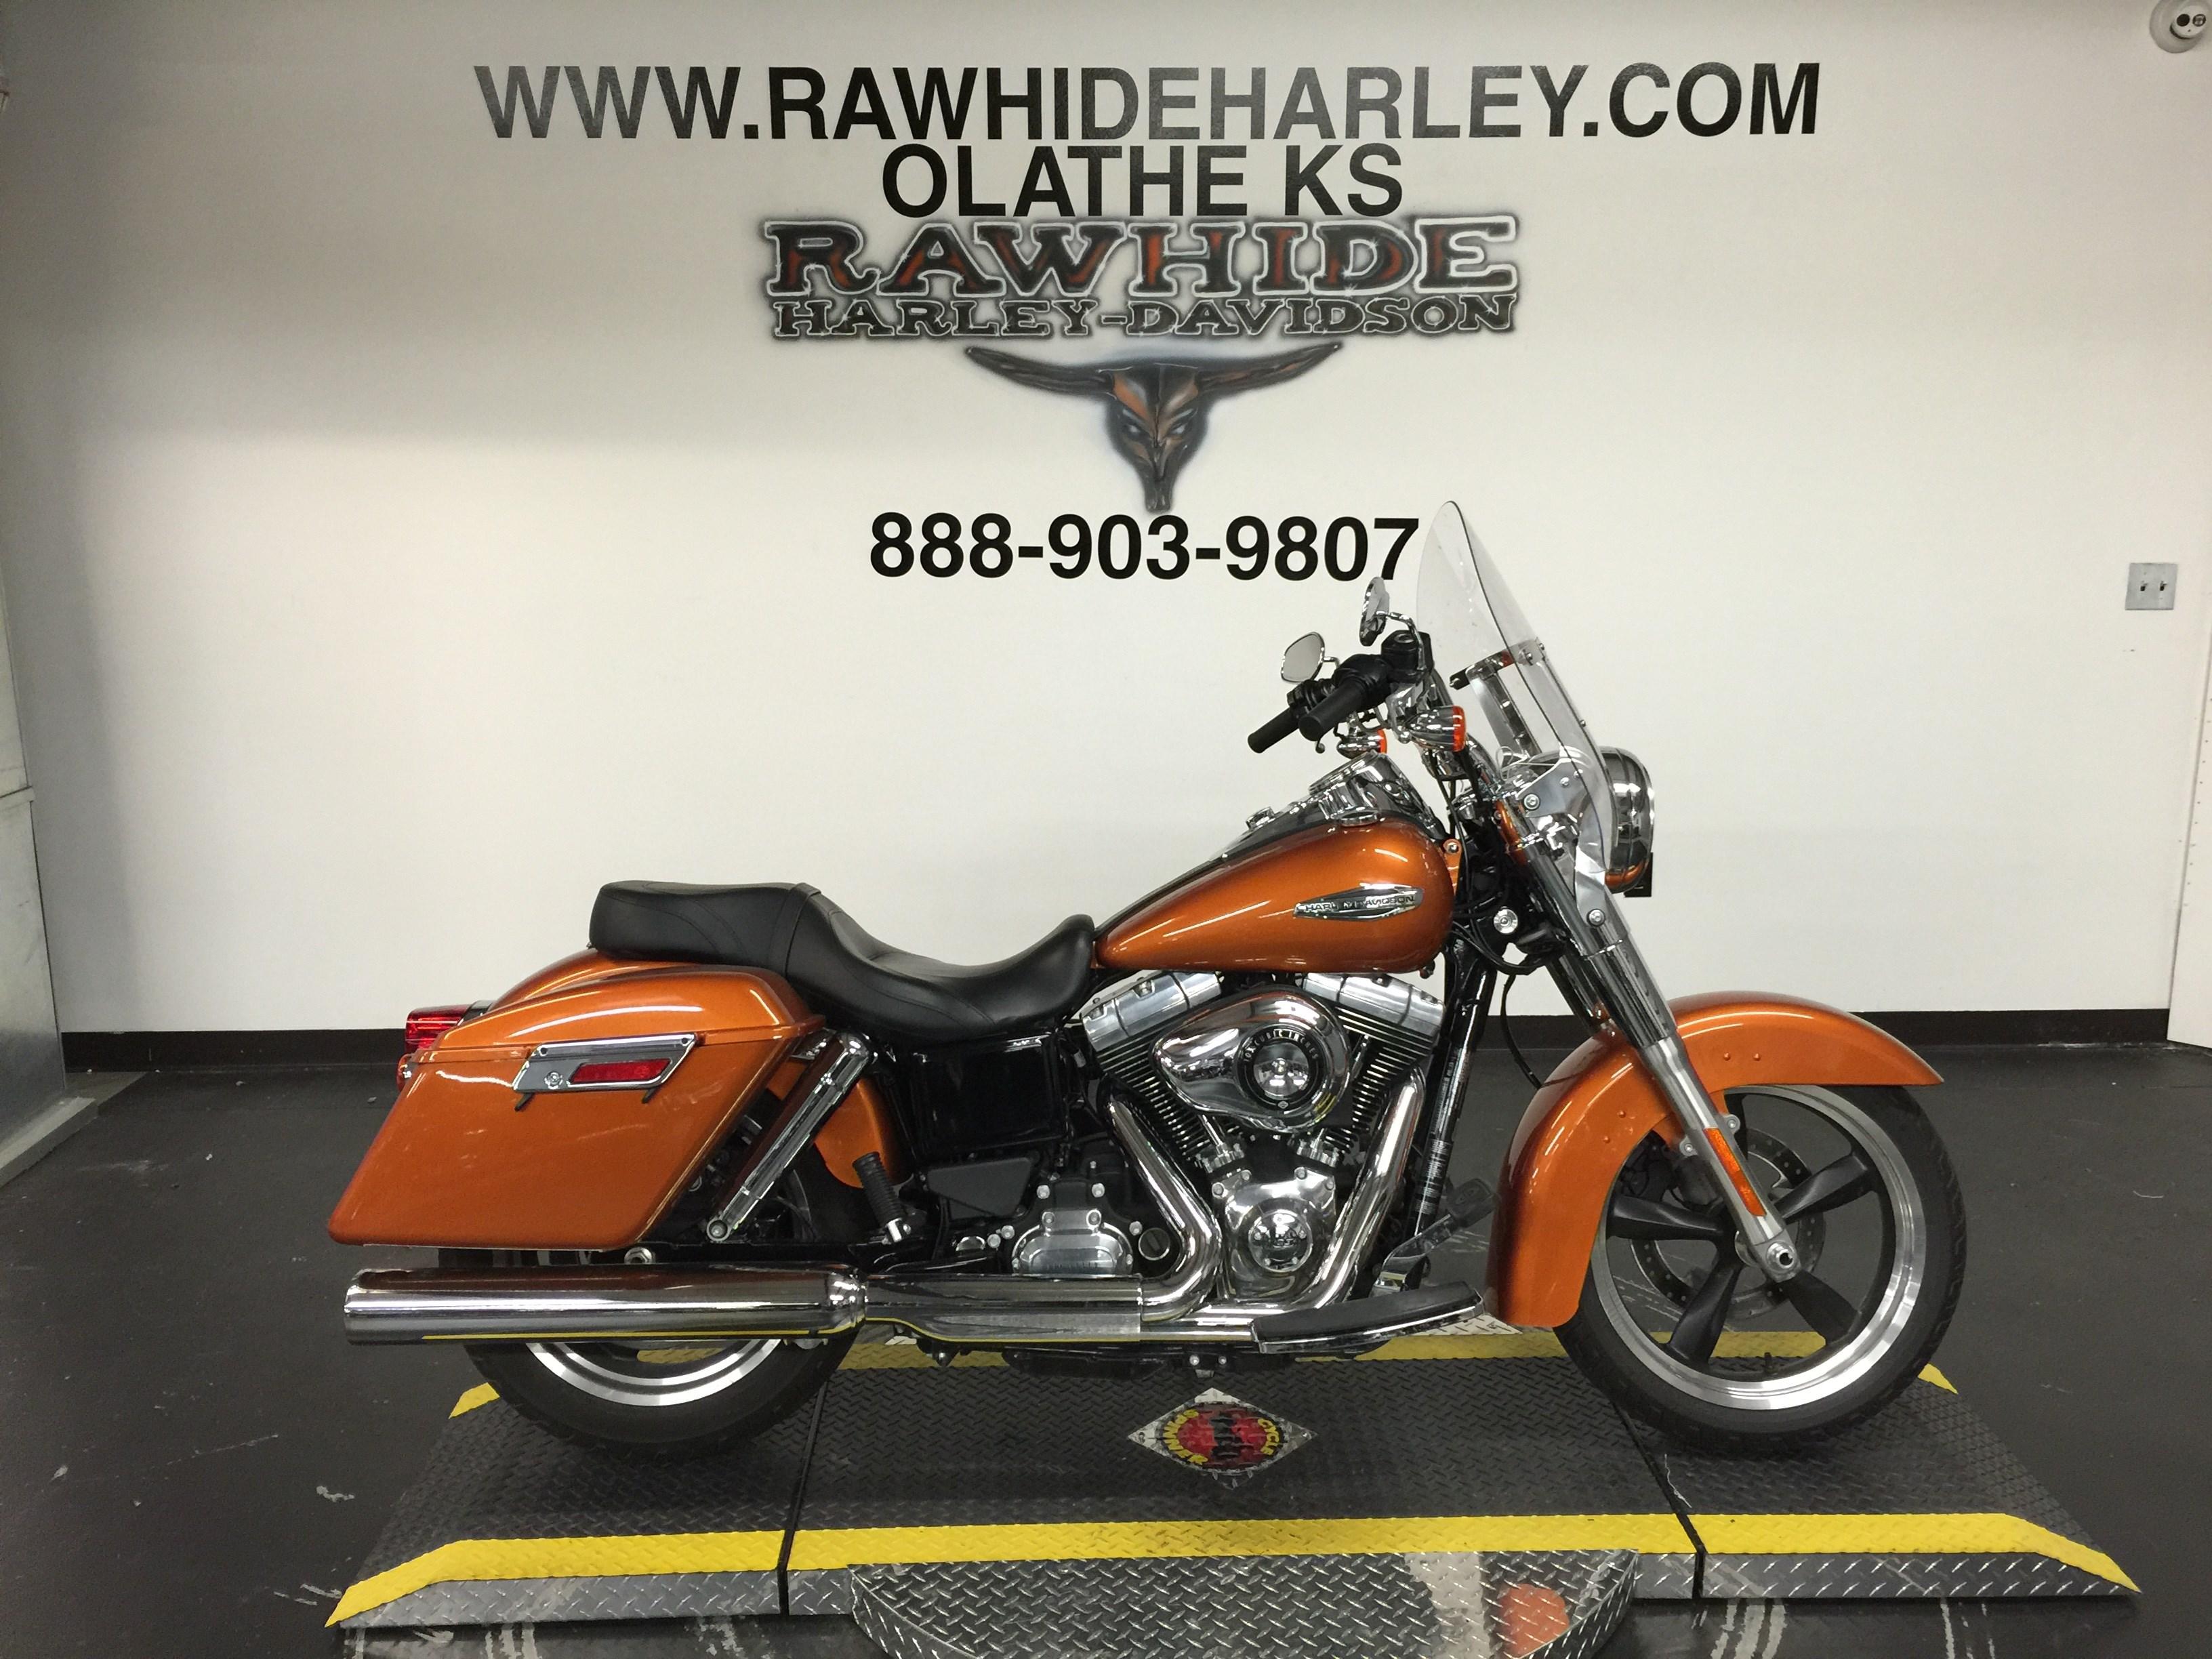 2004 to 2015 Used Harley-Davidson® Dyna Switchback™ near Pittsburg